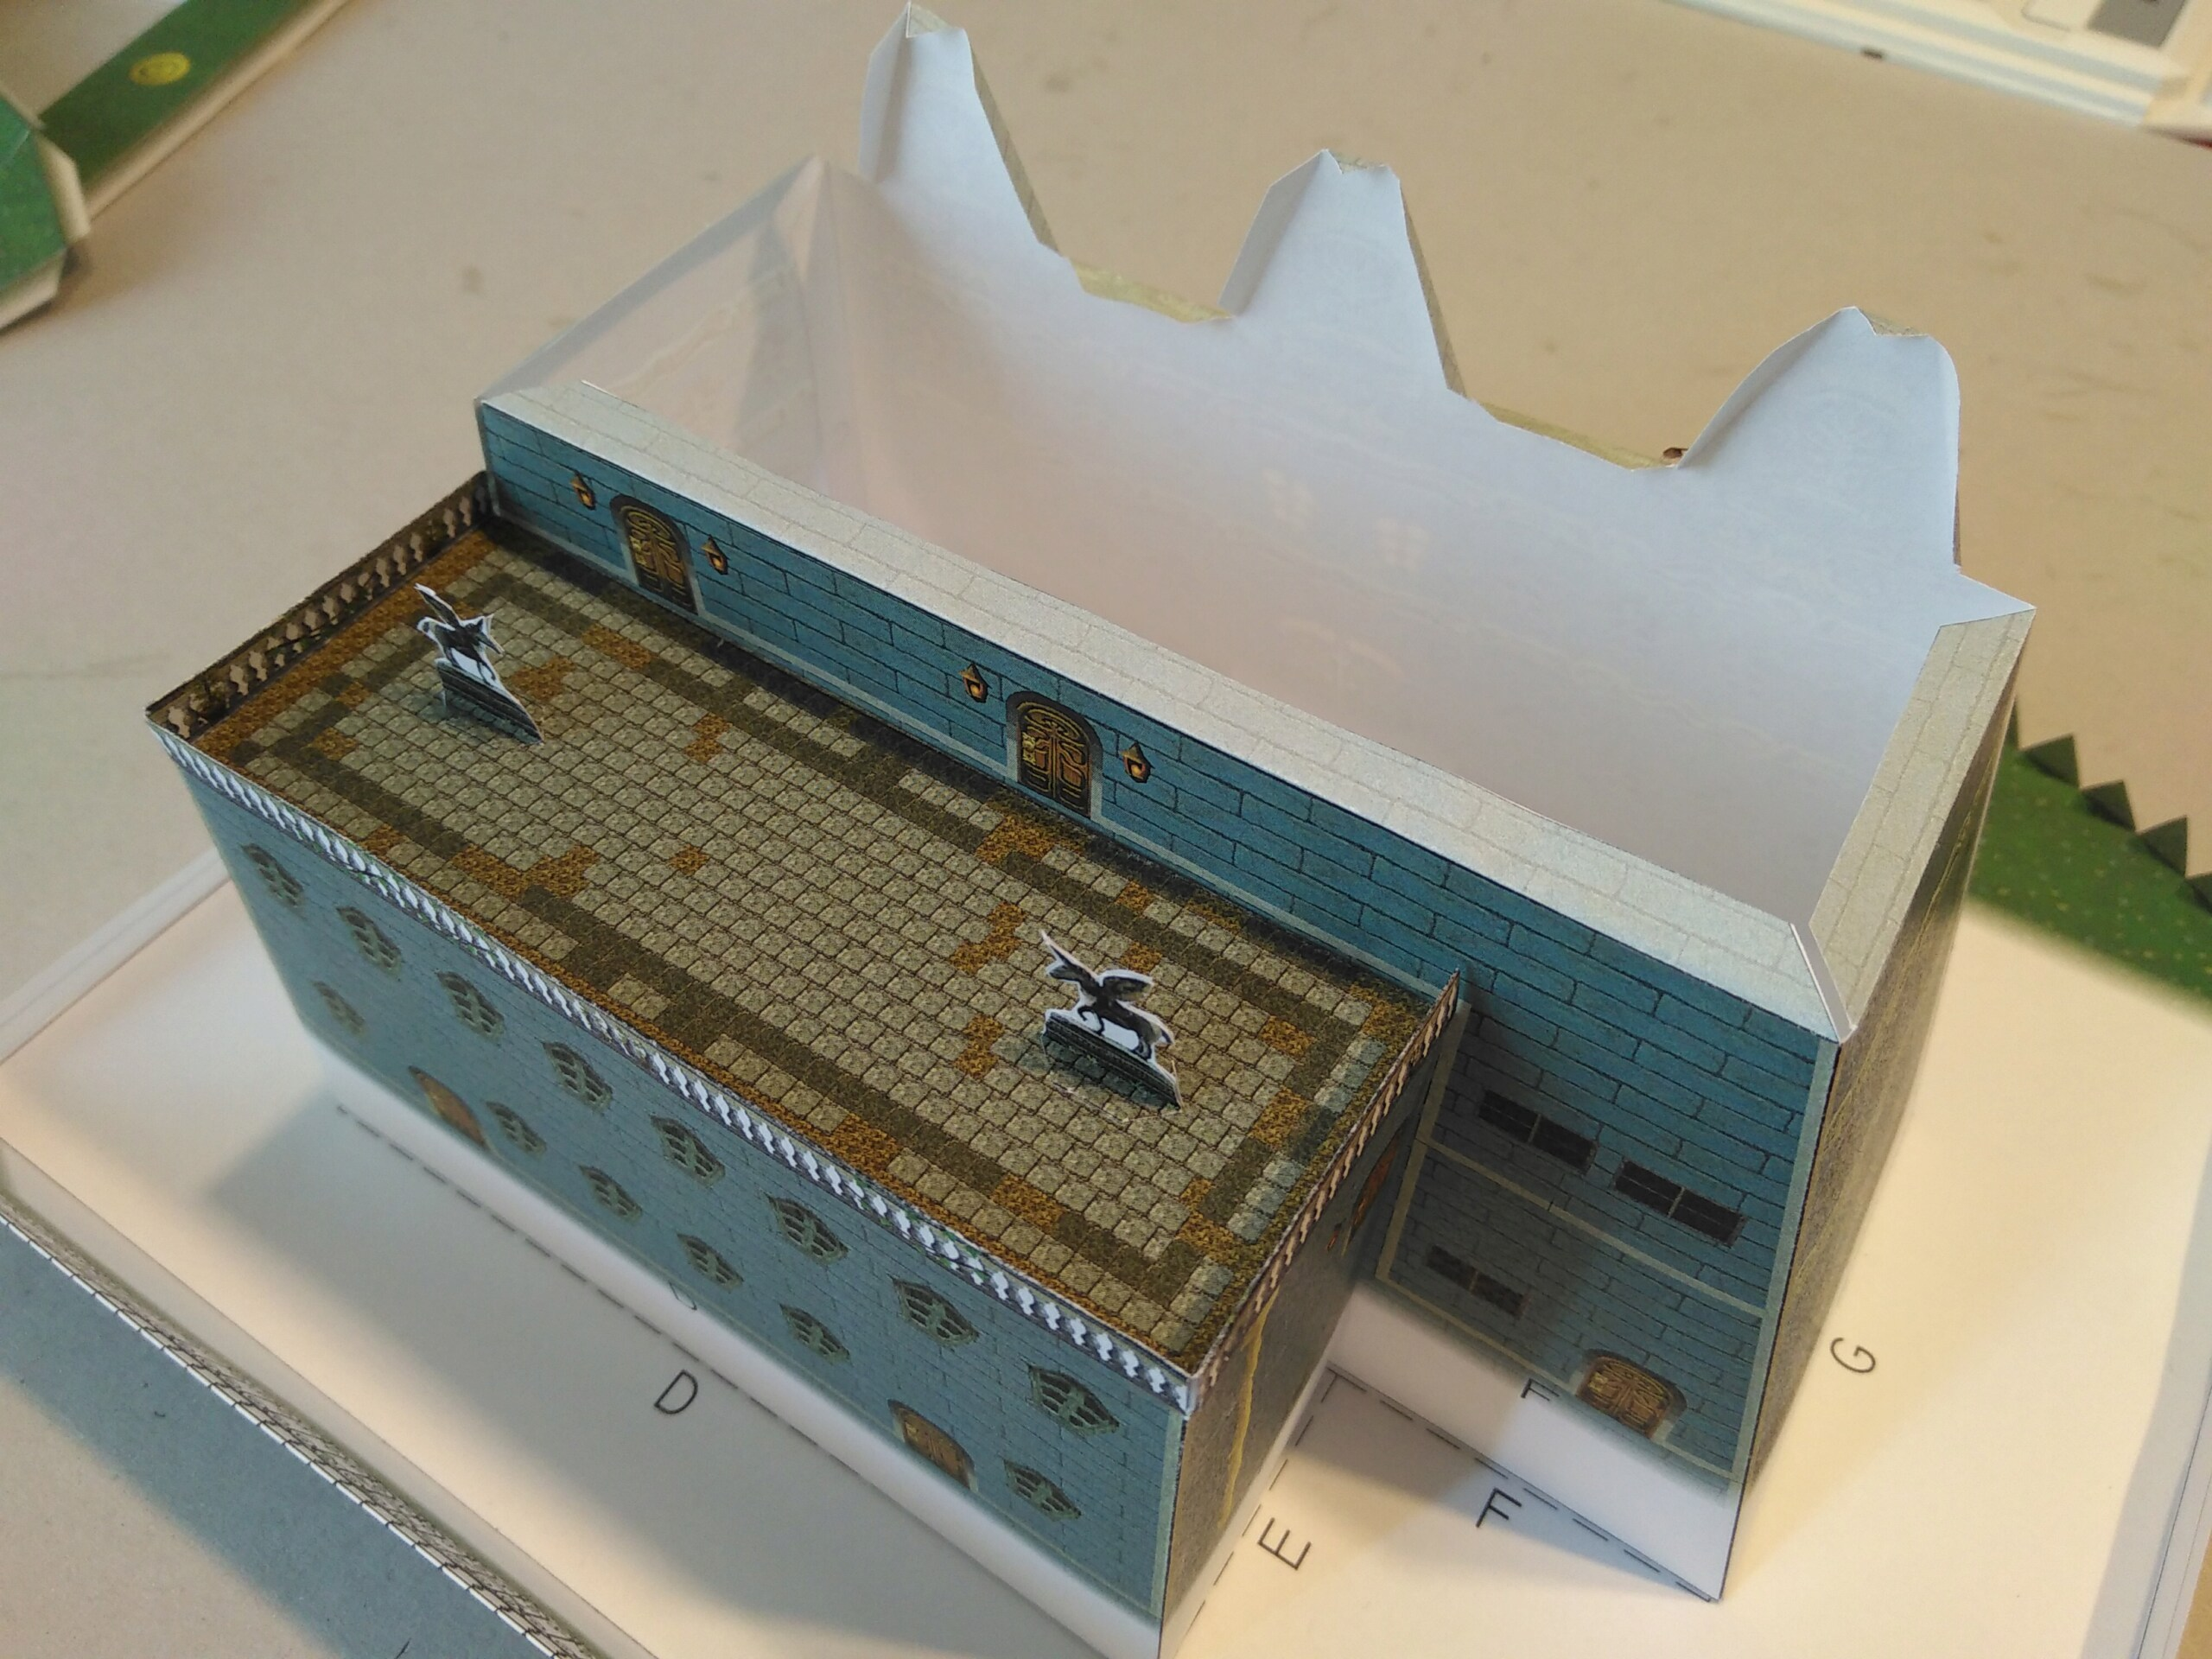 Luigi's Mansion - Die Gruselvilla aus dem Gamecube-Klassiker Img_2028